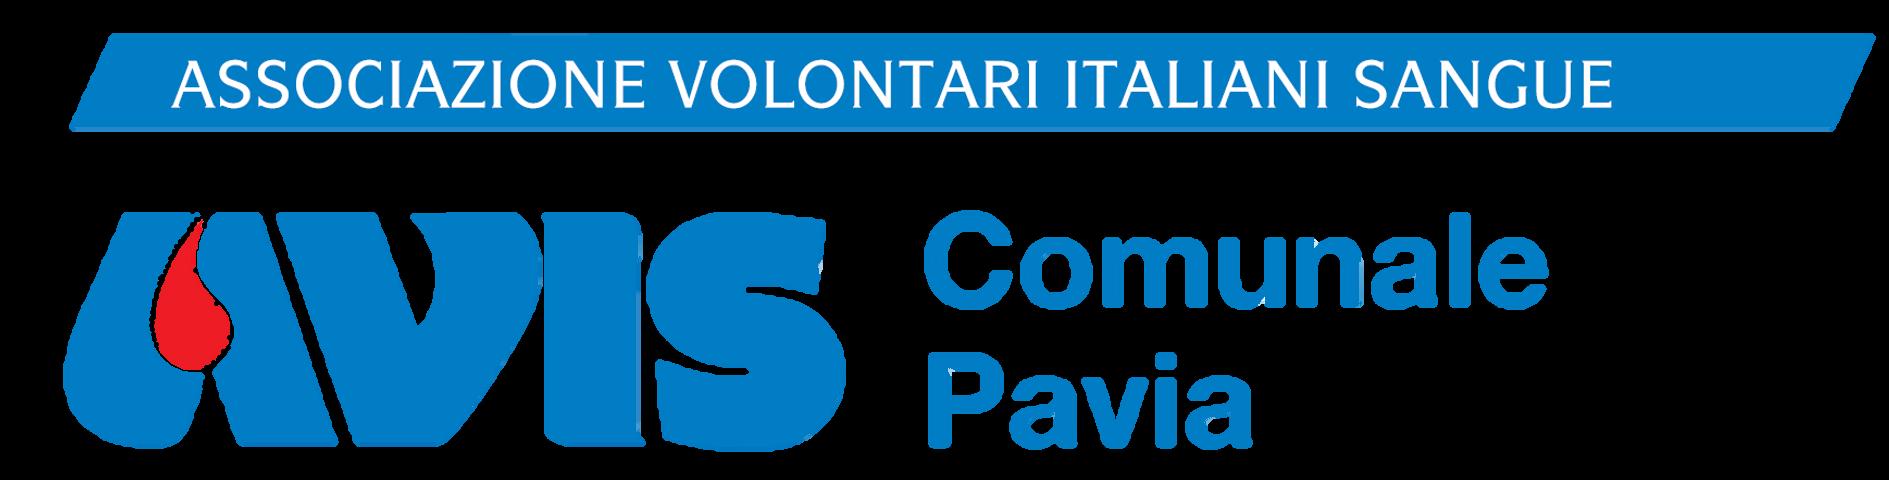 Logo Avis Pavia